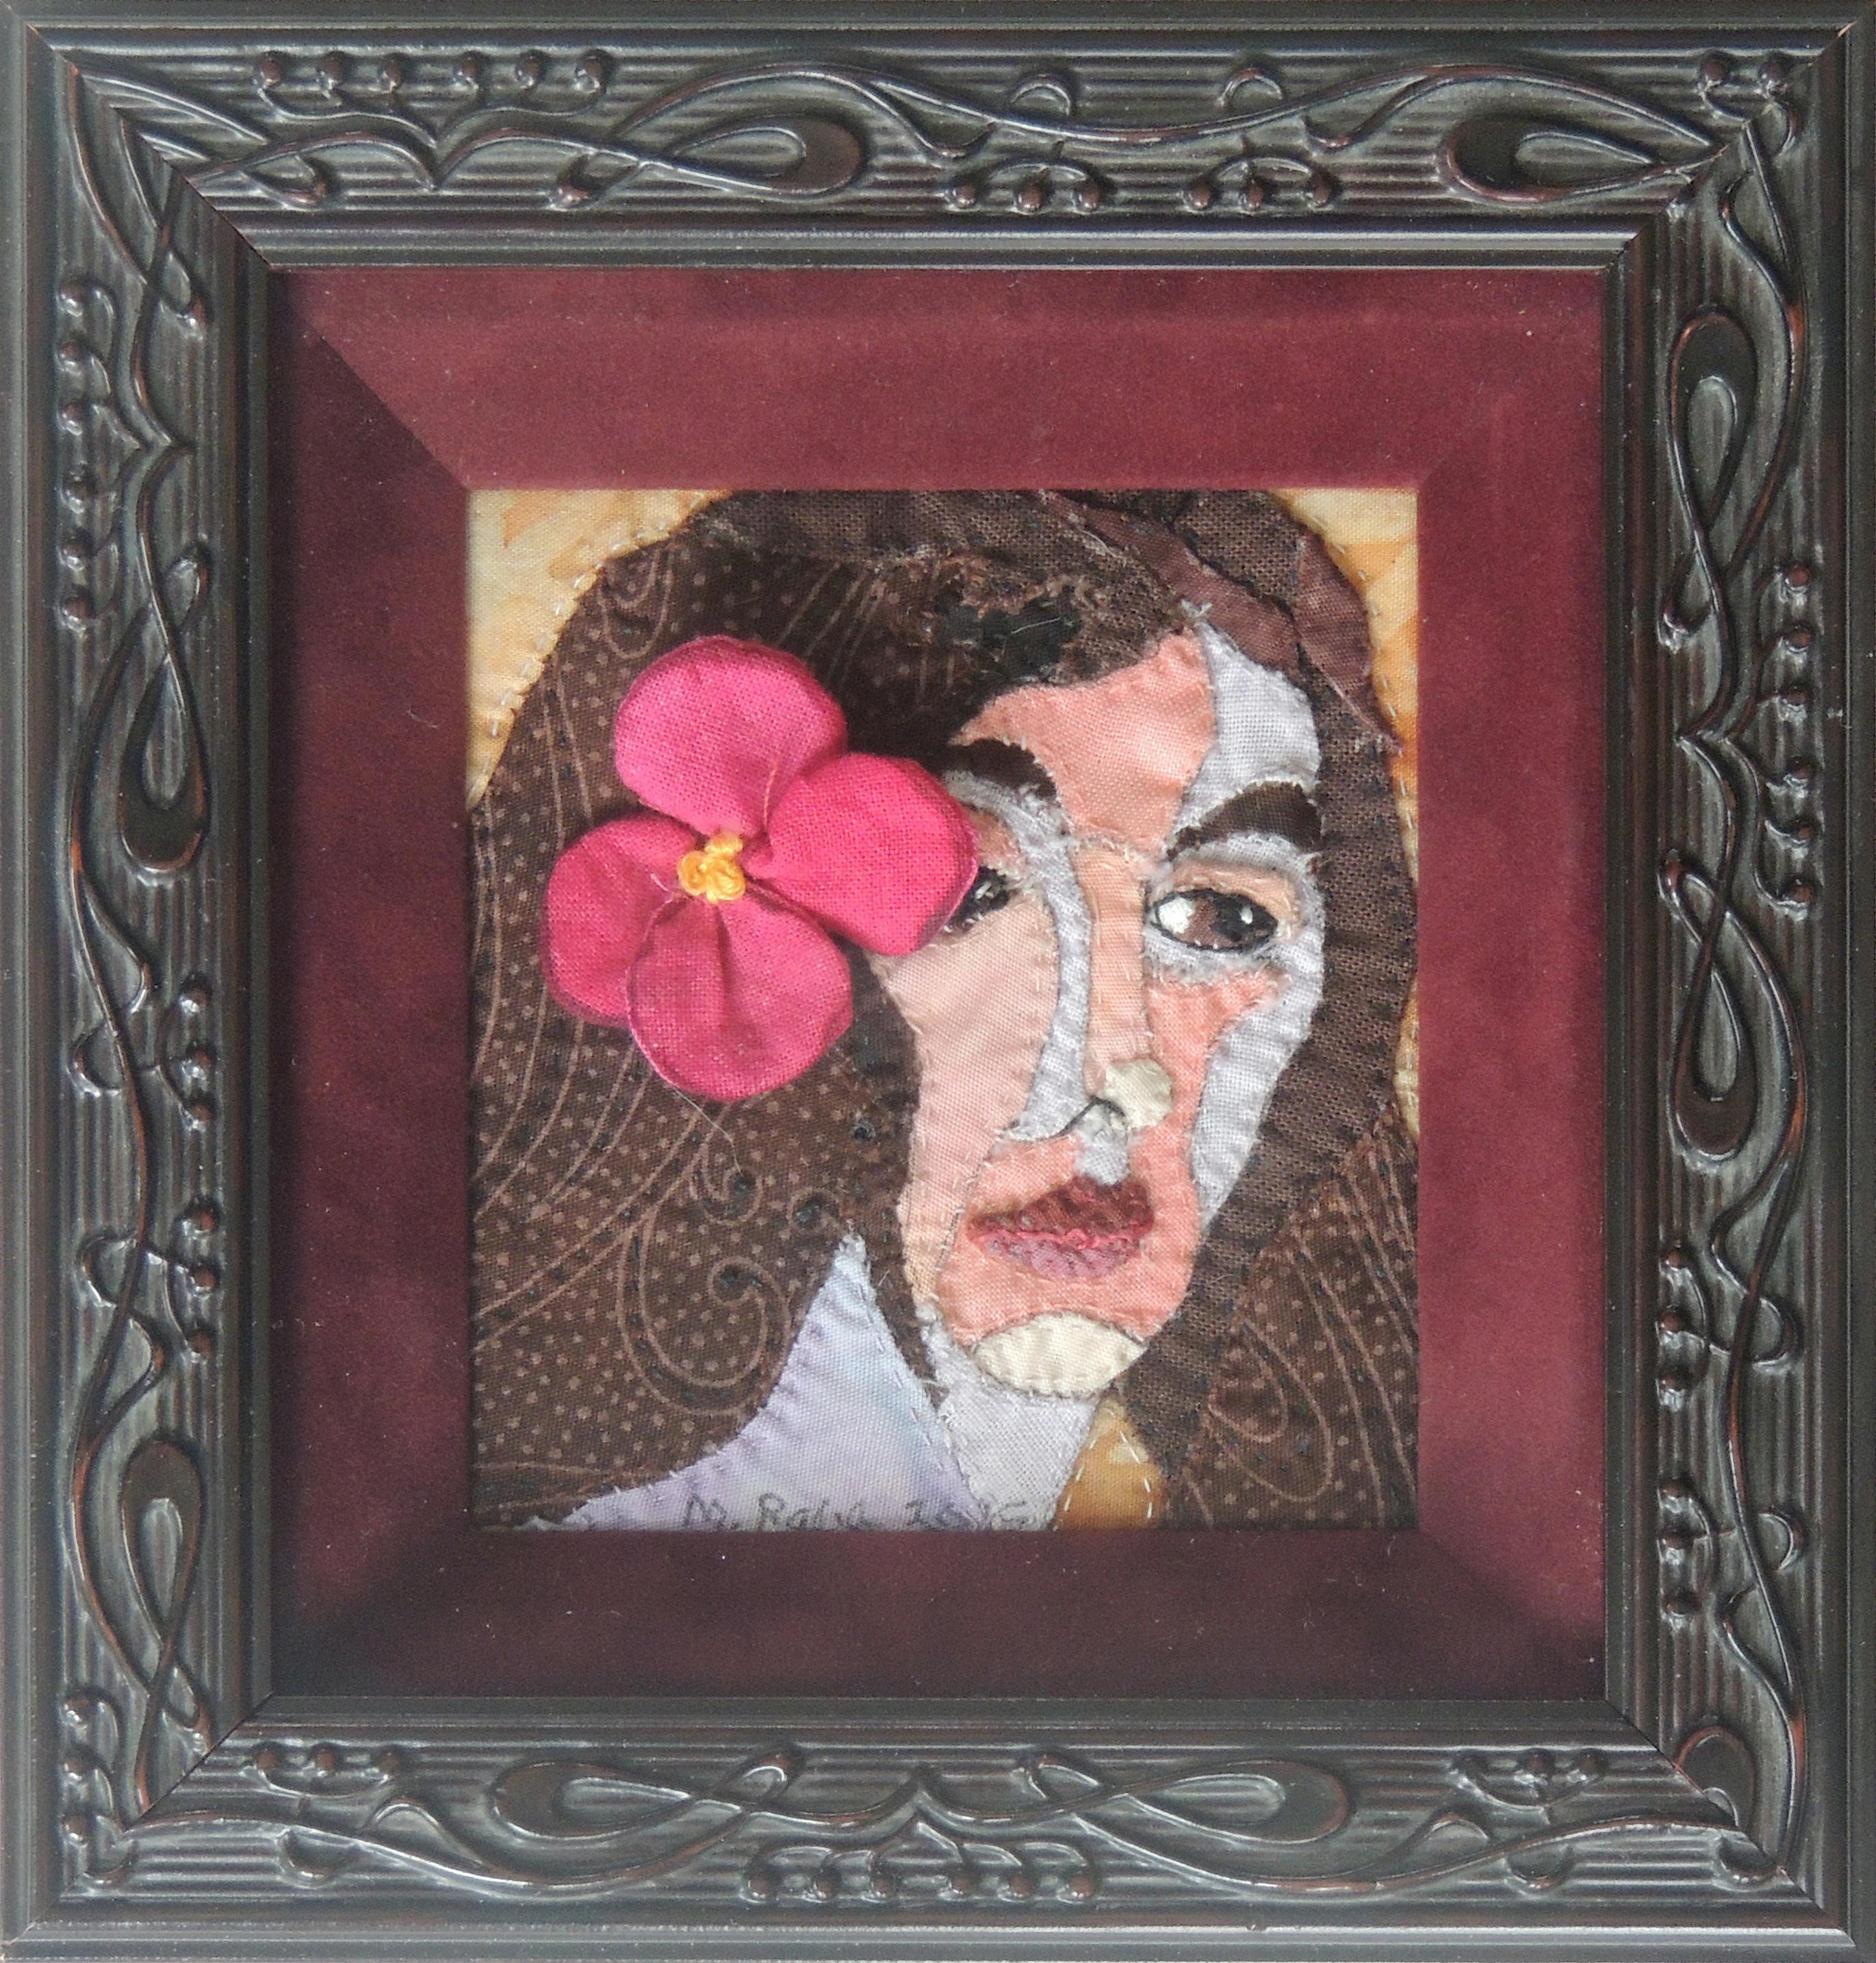 "Marianne Rabb Britton | RED FLOWER | Fabric & Embroidery | 6 x 6"" | Estate of Marianne Rabb Britton"